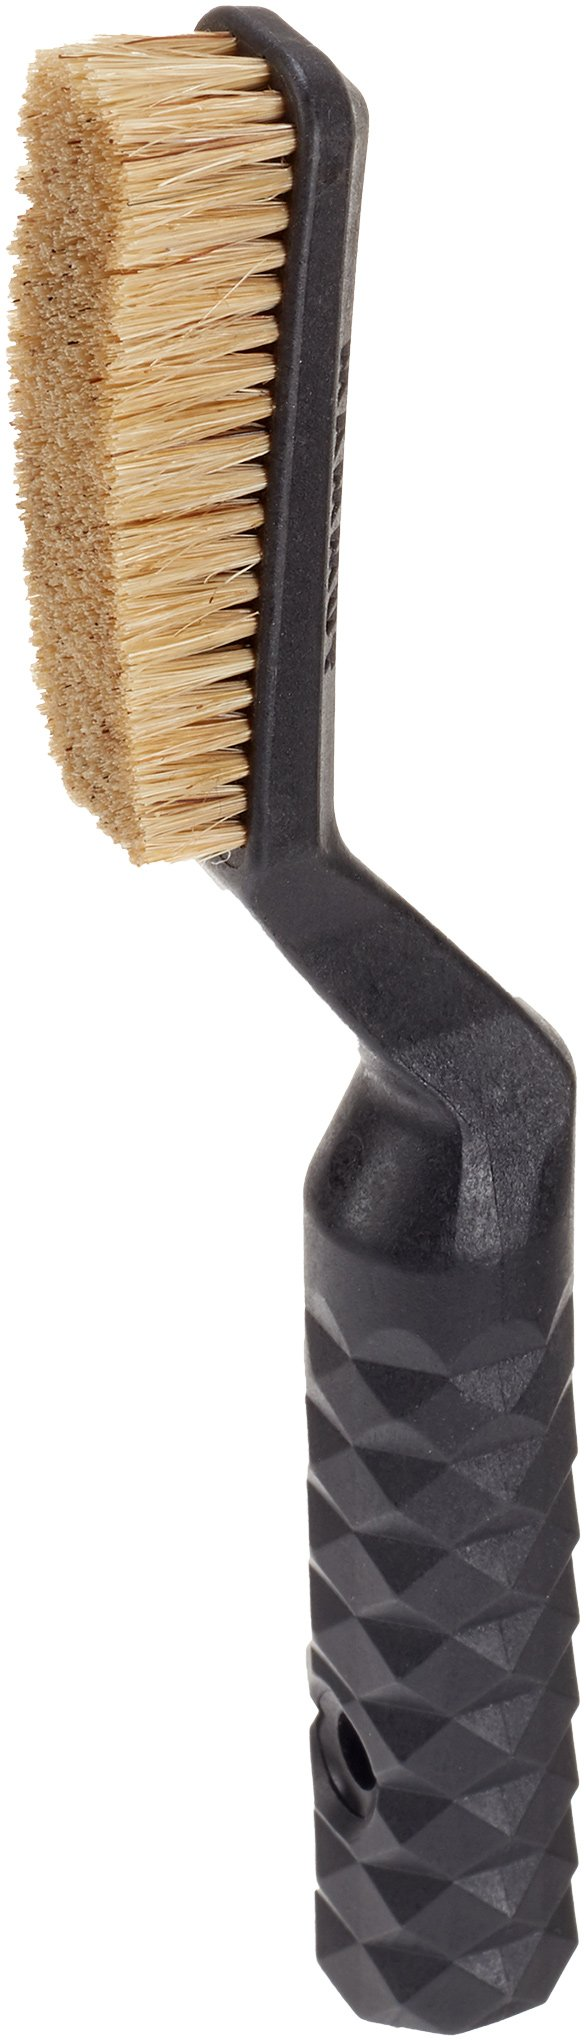 Mammut Crimper Brush